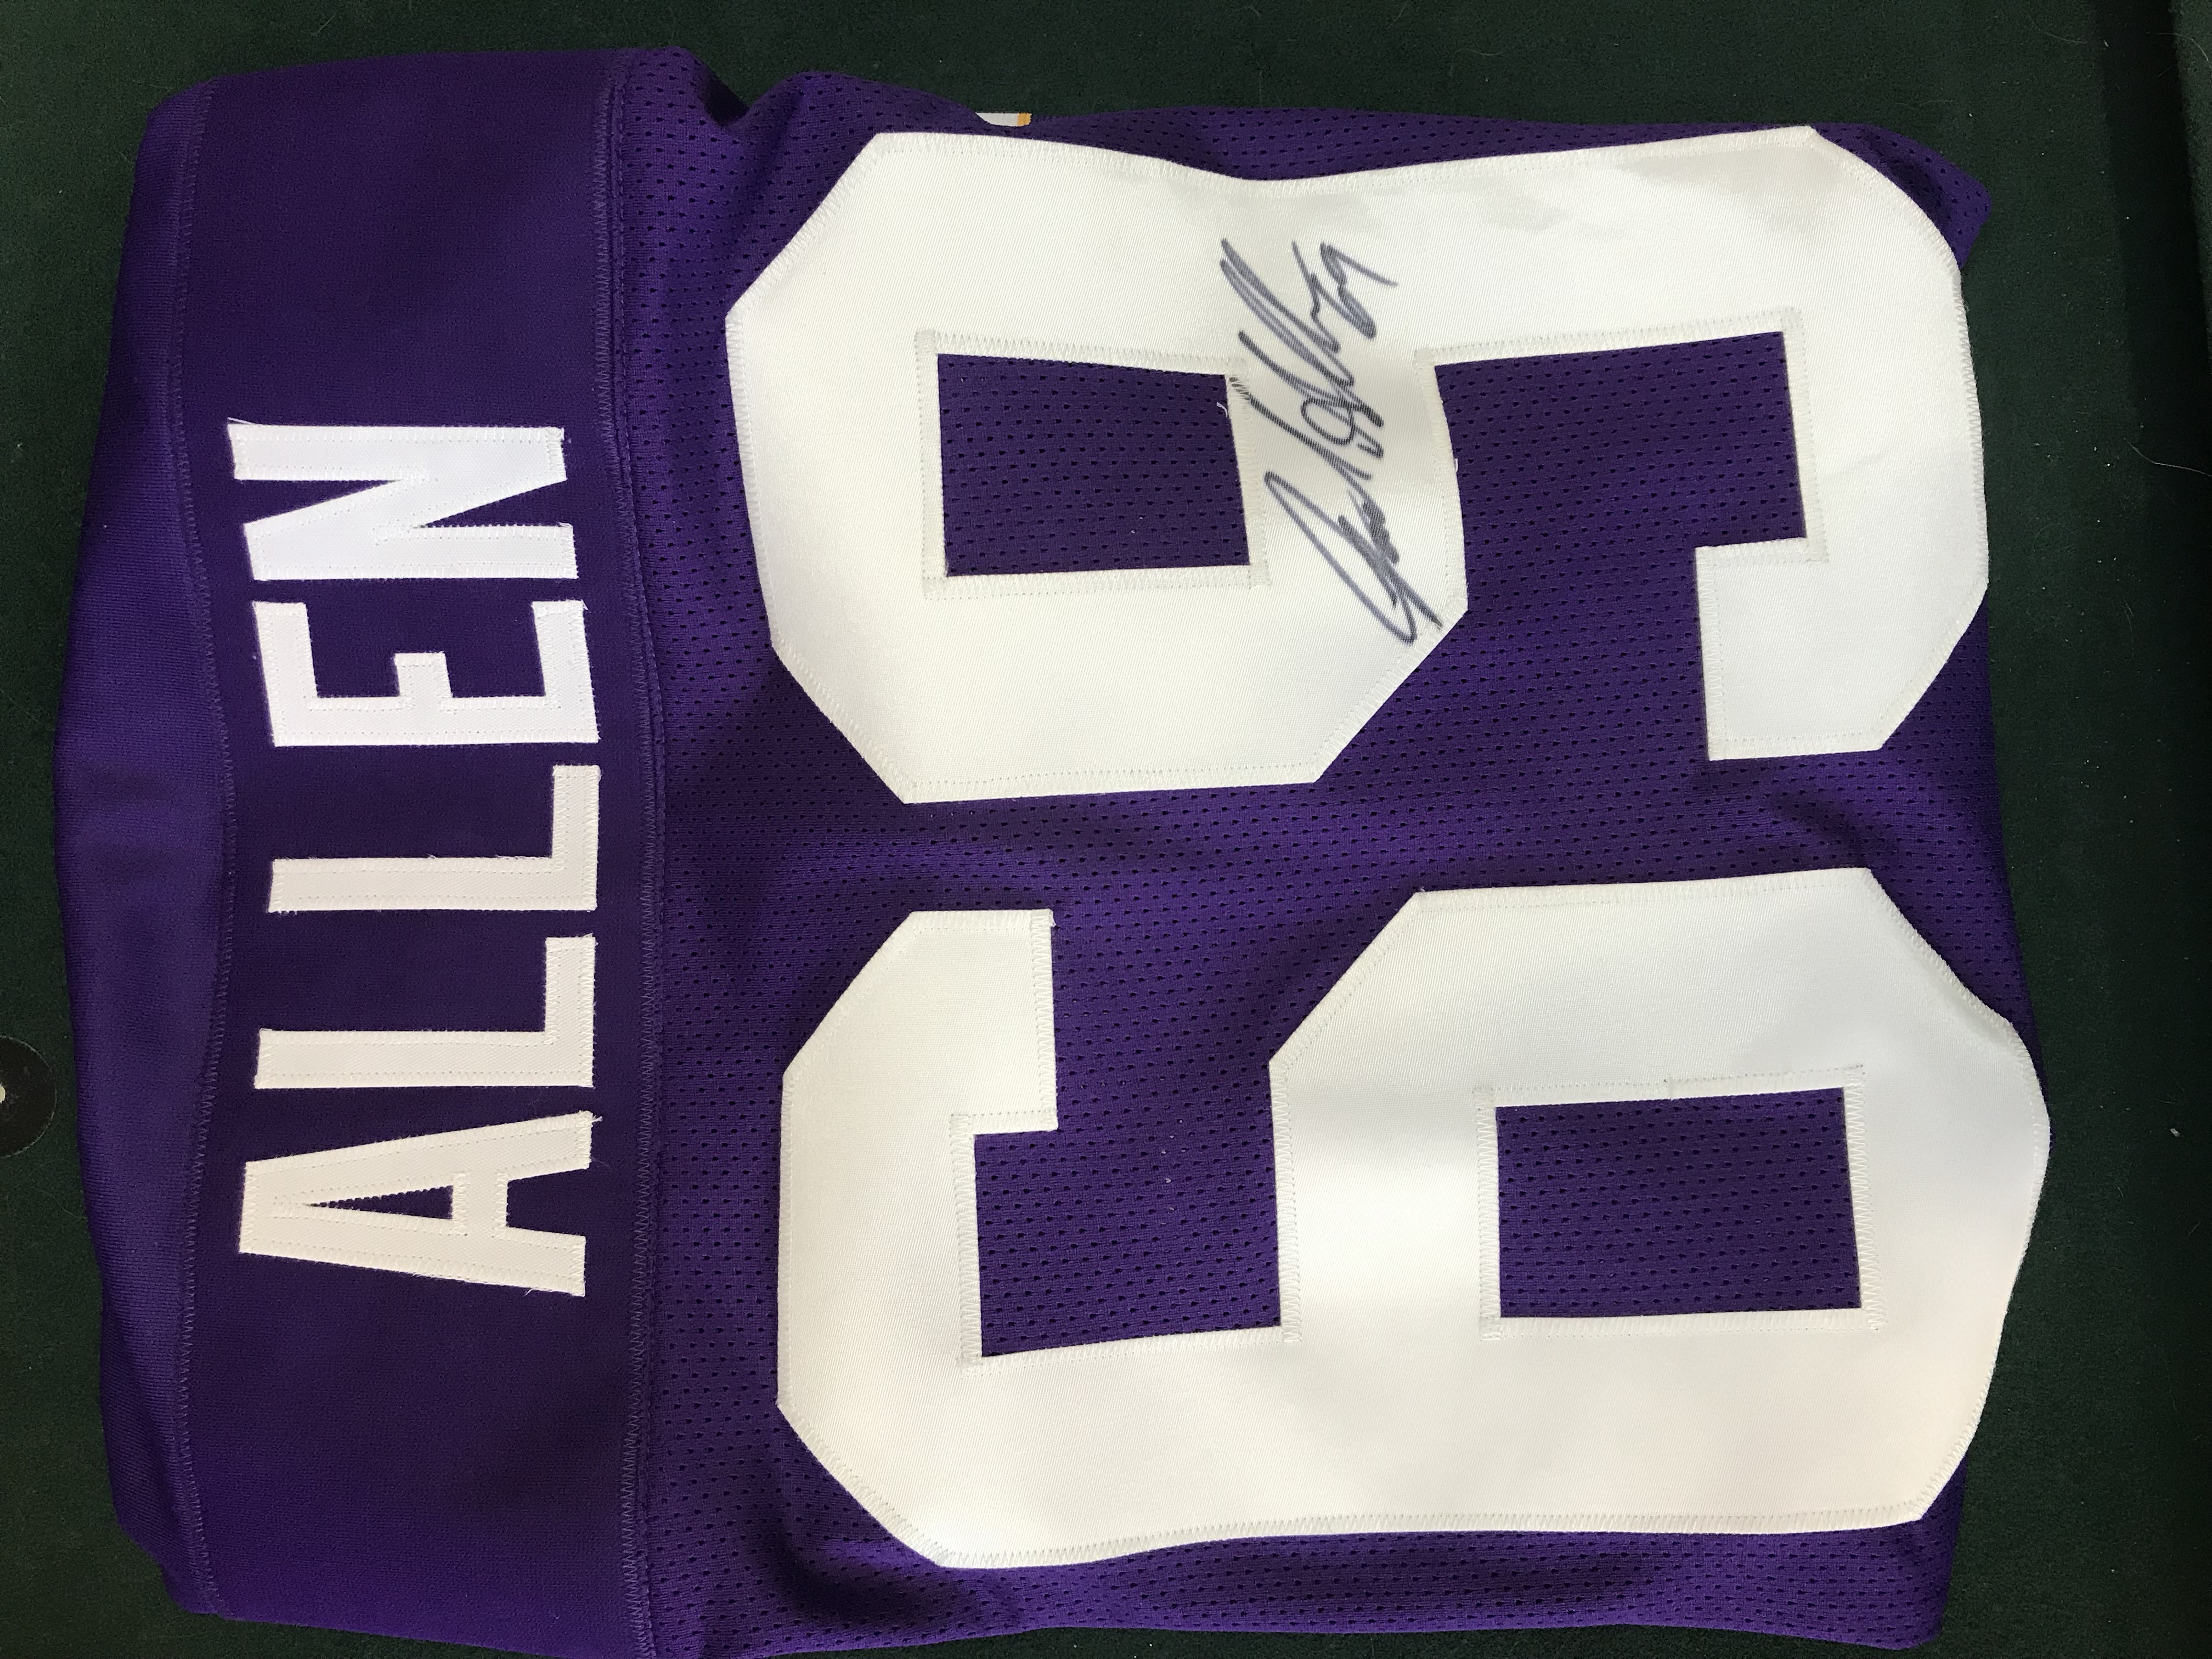 Jared Allen Autographed Jersey